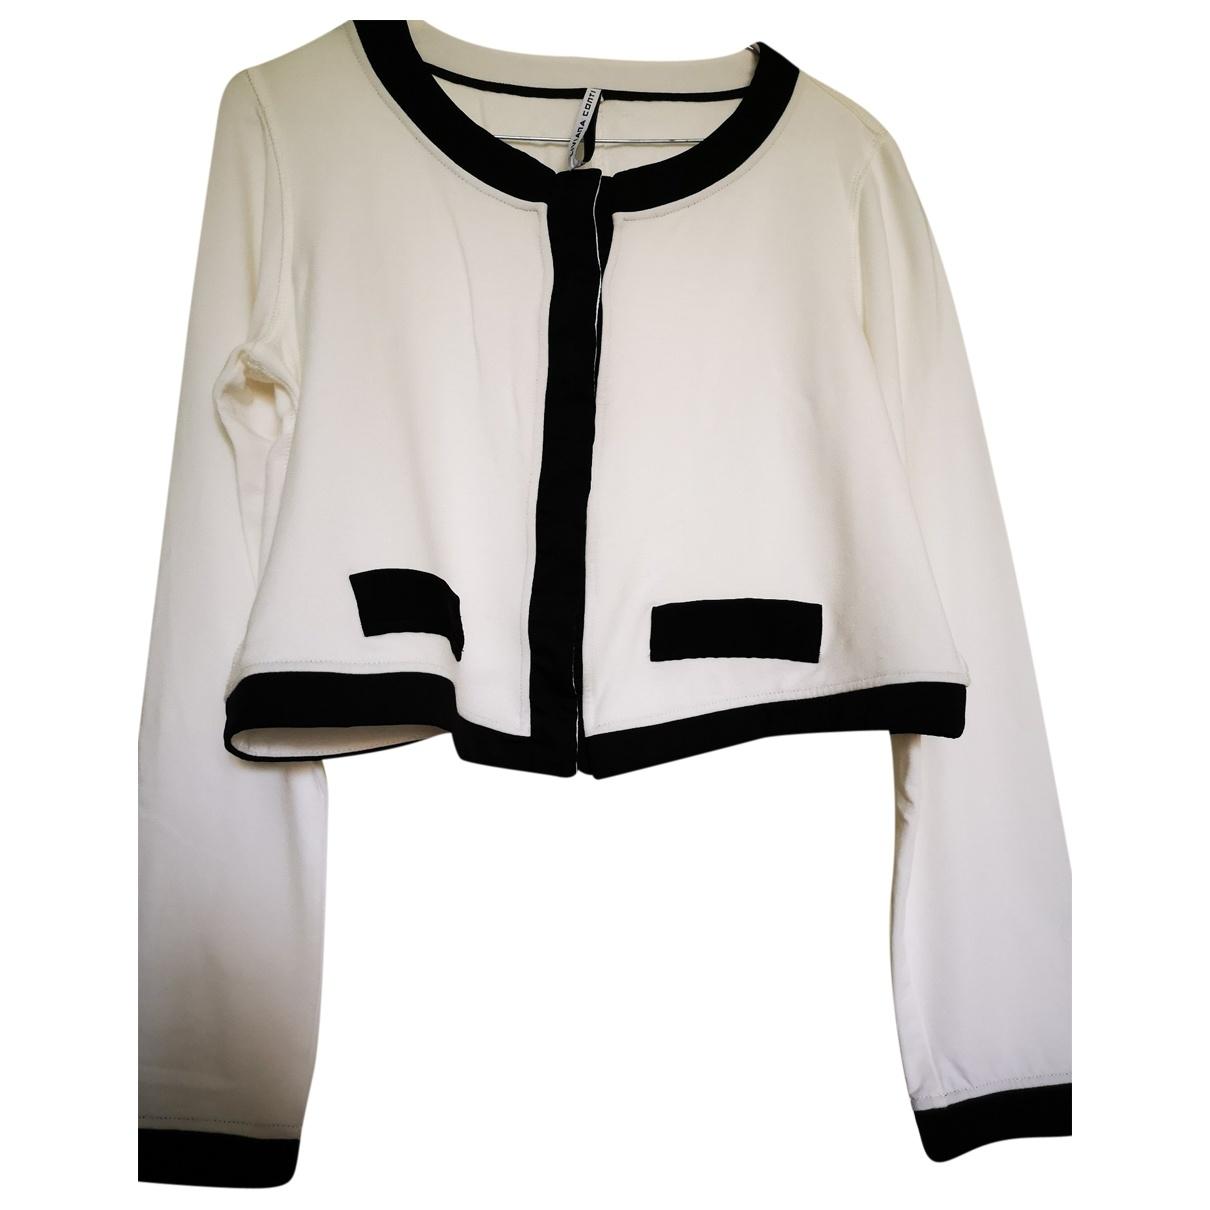 Liviana Conti \N White jumpsuit for Women M International